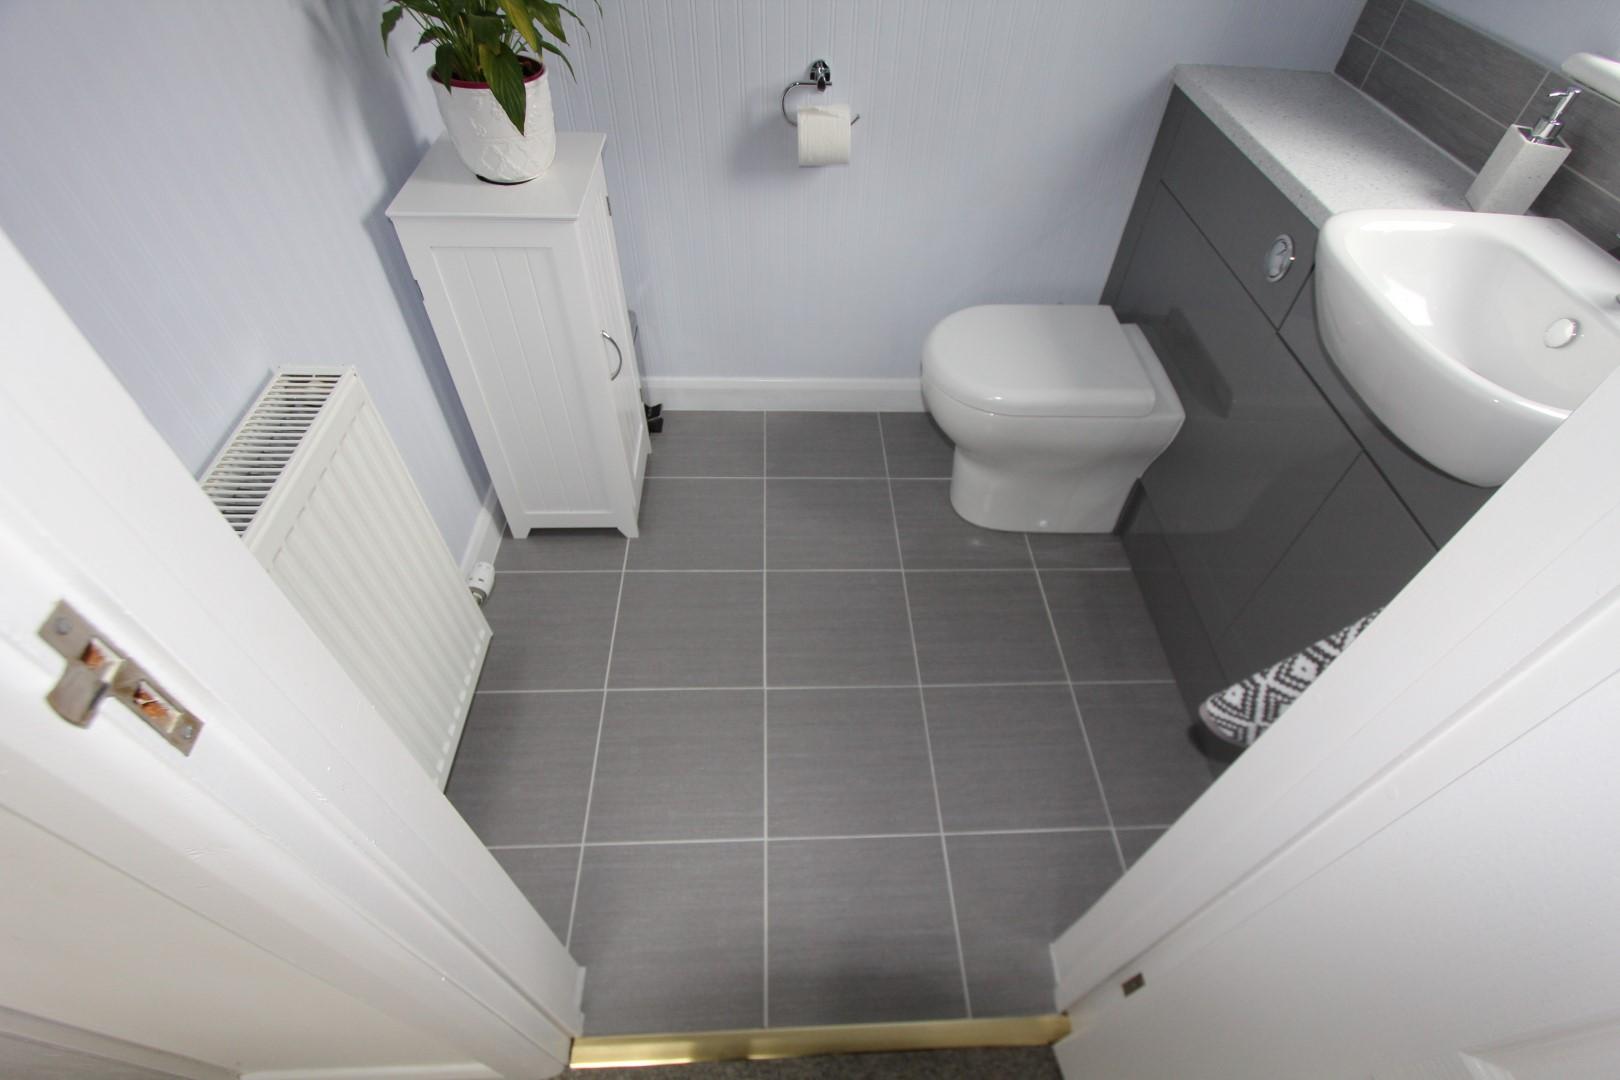 Filby Bintee - Atlantic Bathrooms & Kitchens (1).jpeg